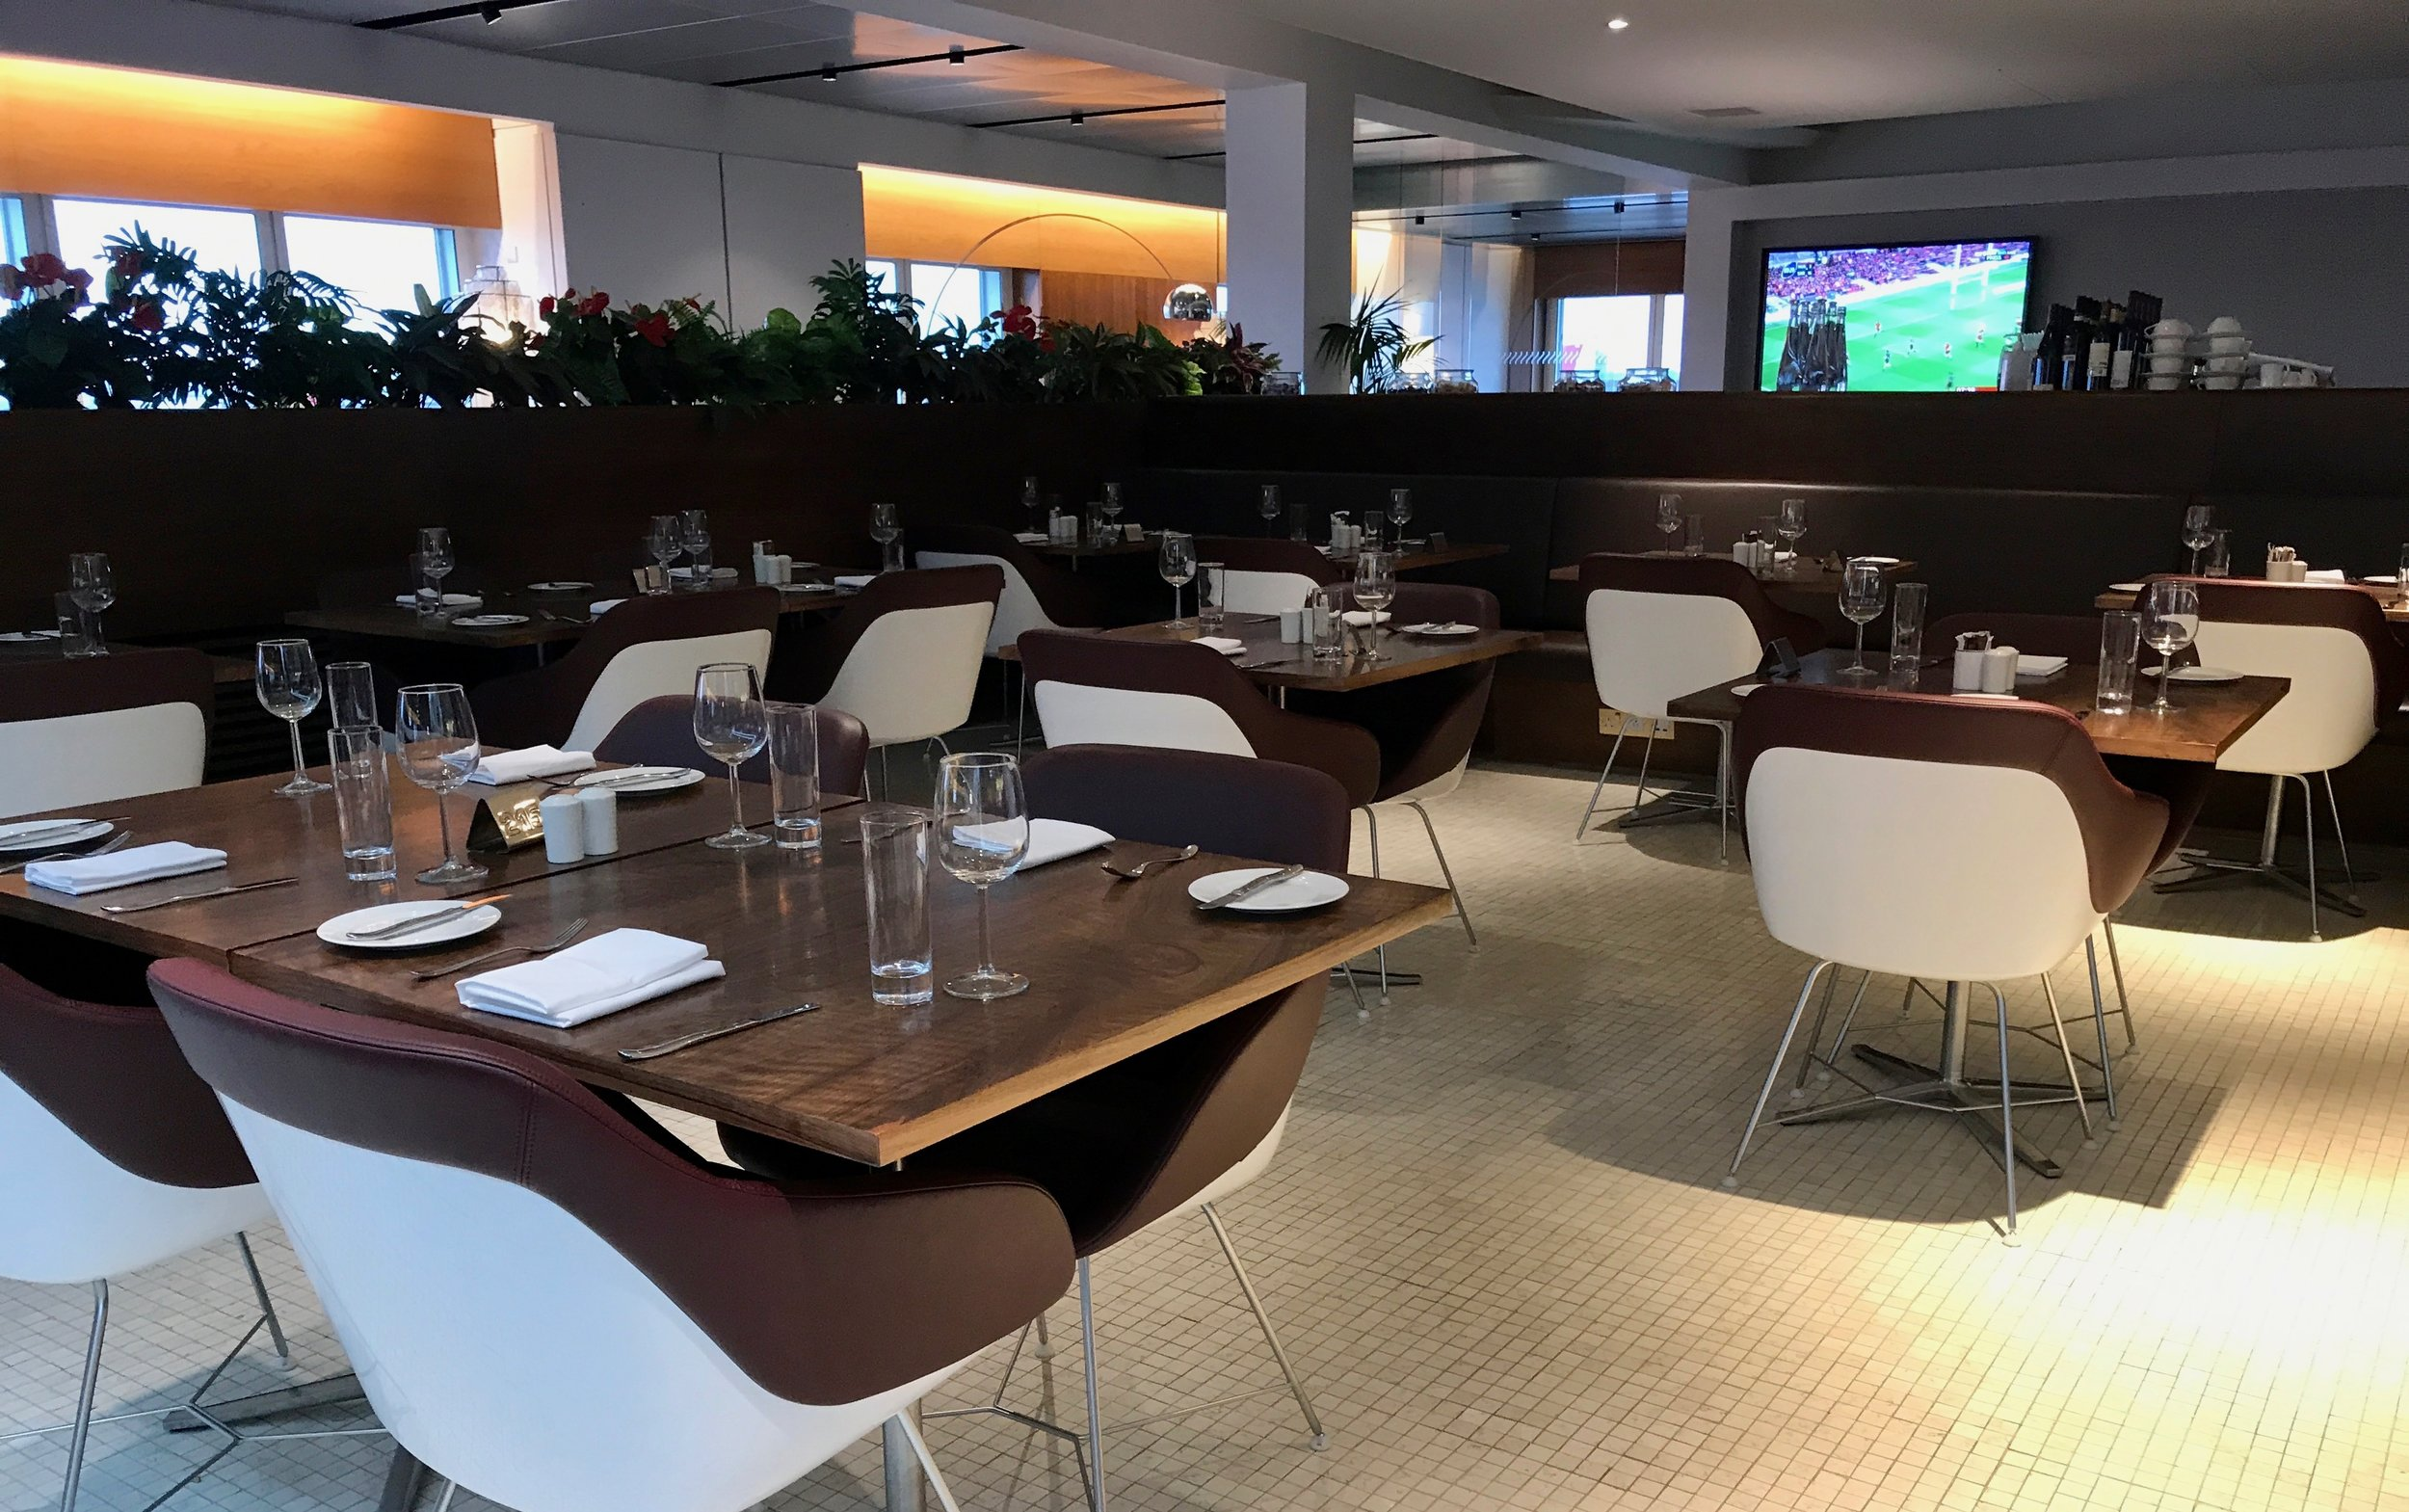 Virgin Atlantic Clubhouse Lounge London Heathrow LHR Airport - 23.jpg